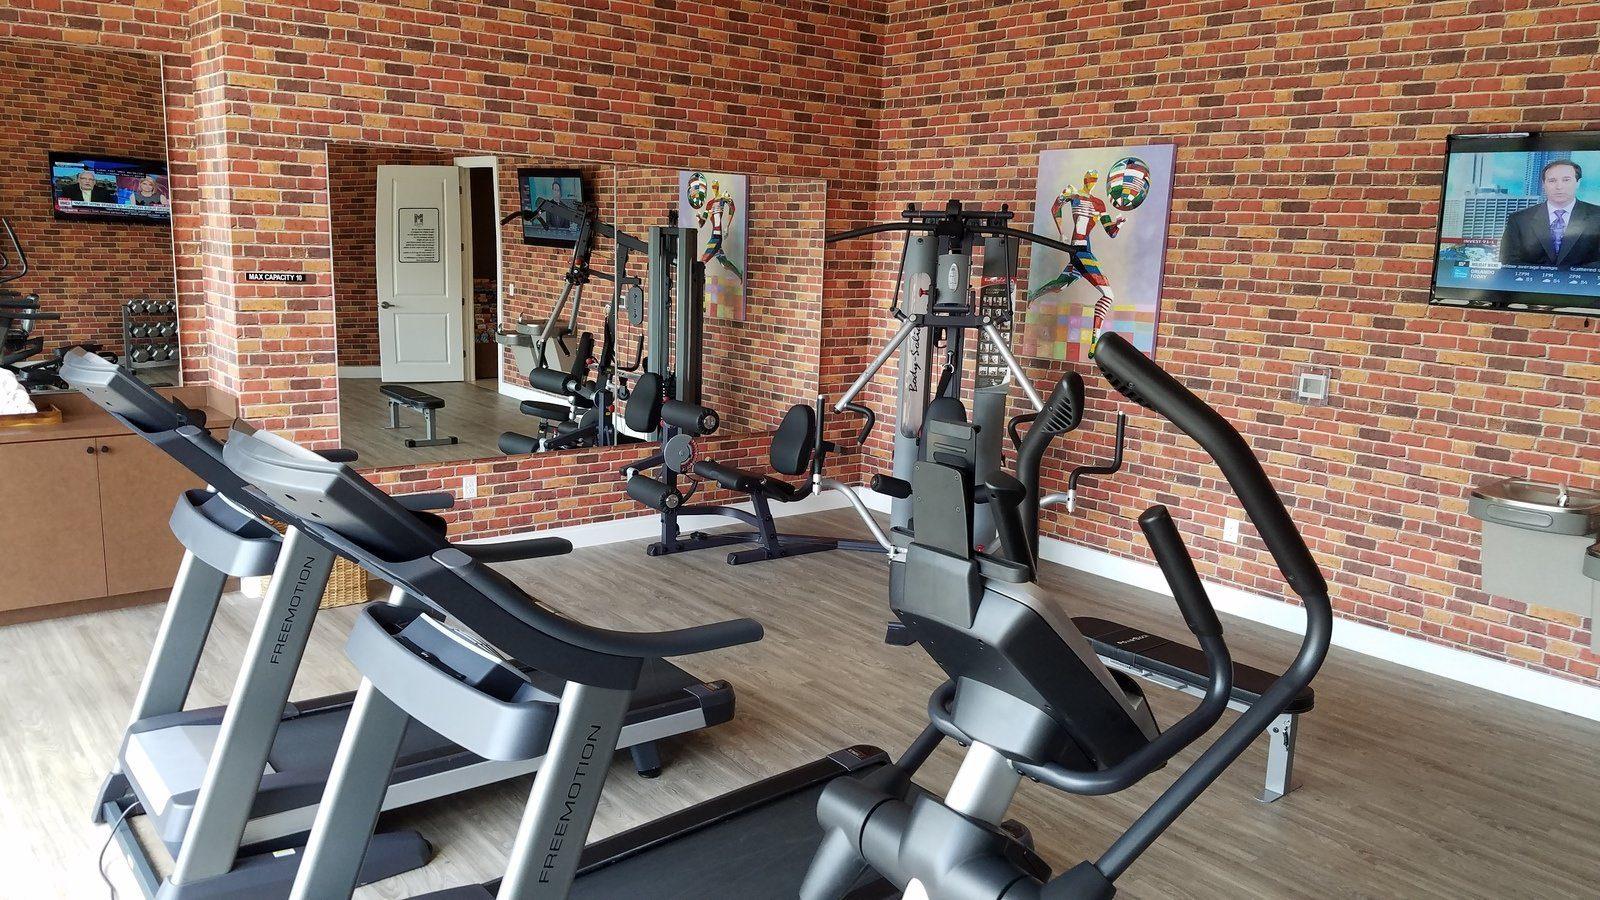 Magic-Village-Fitness-Center